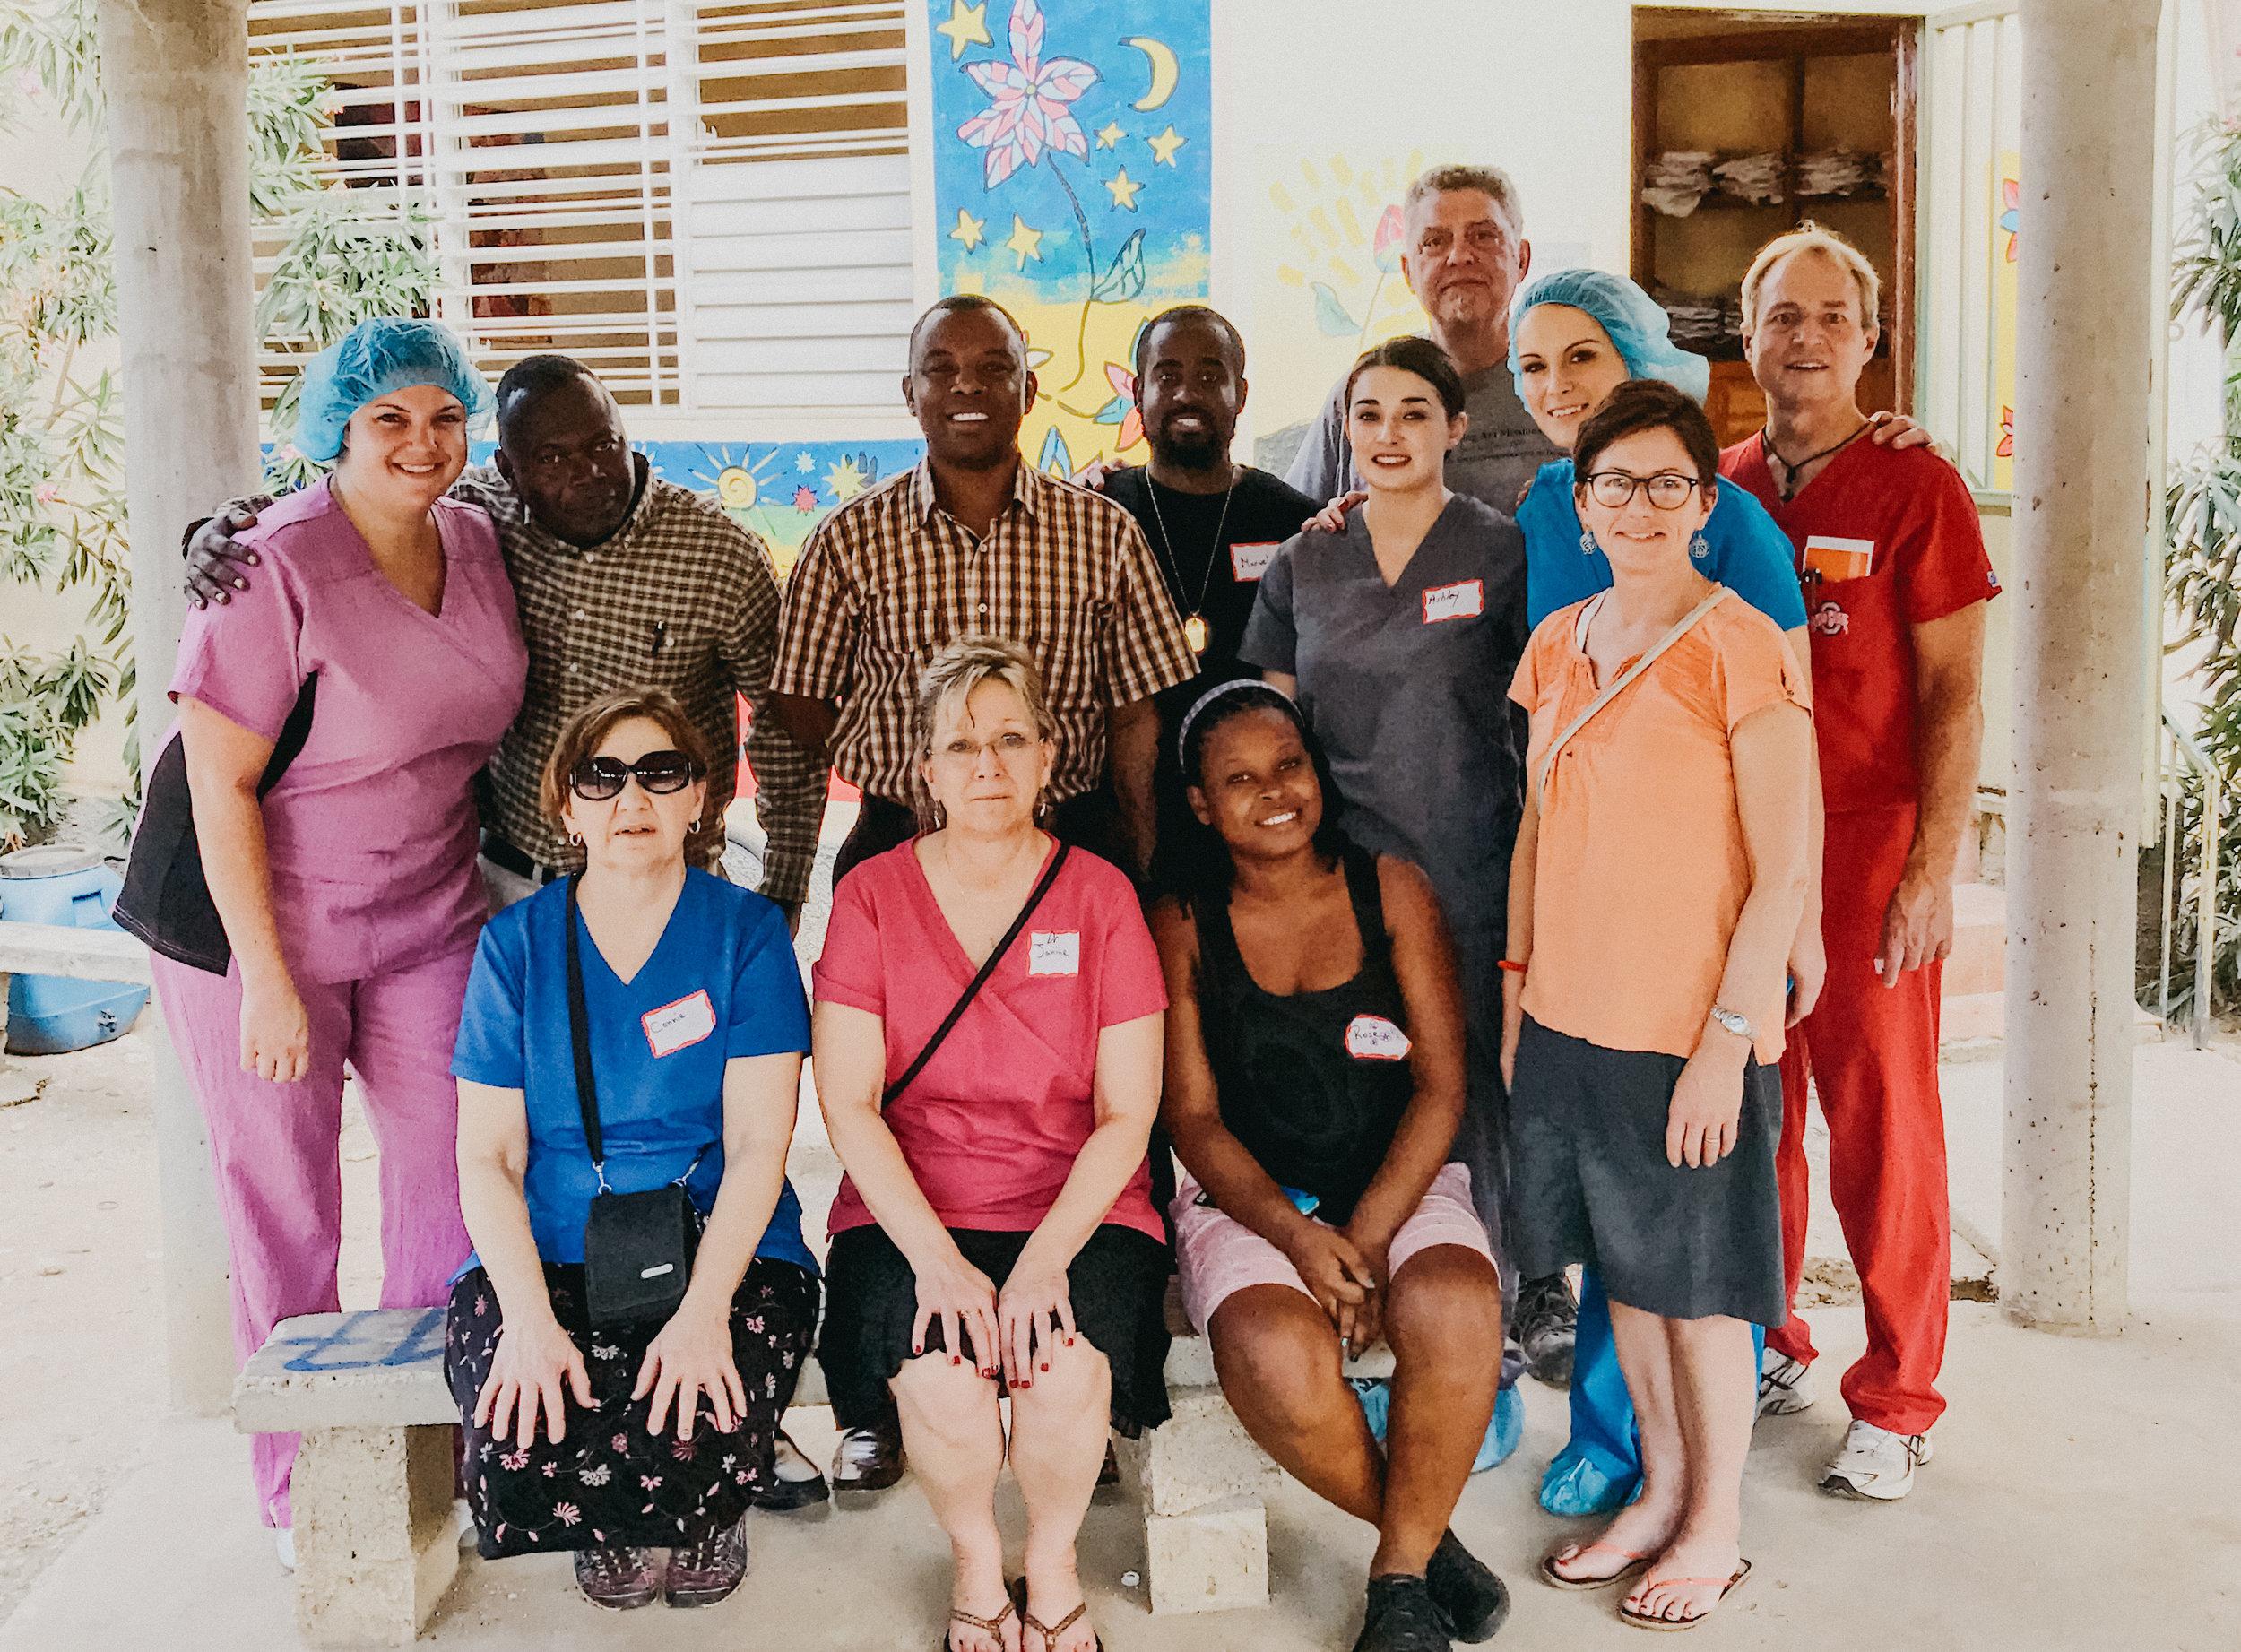 Haiti_Medical_Missions_Healing_Art_Missions001.JPG